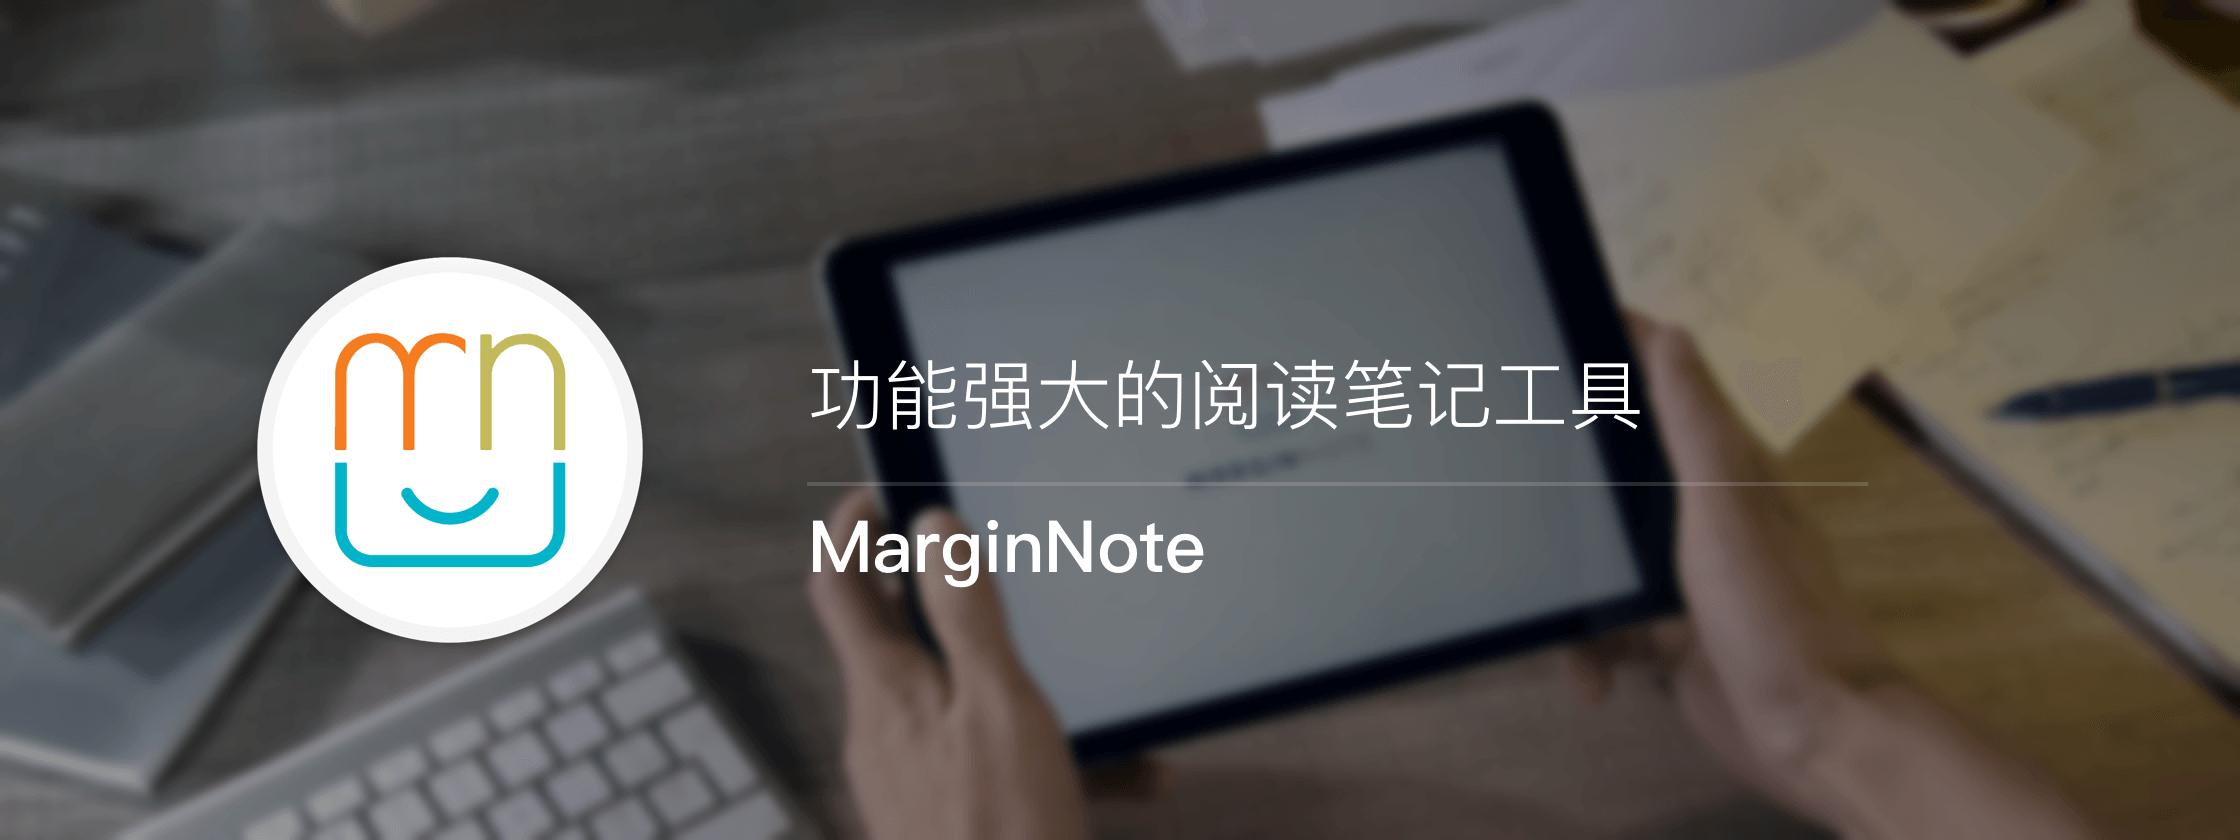 MarginNote,功能强大的阅读笔记工具